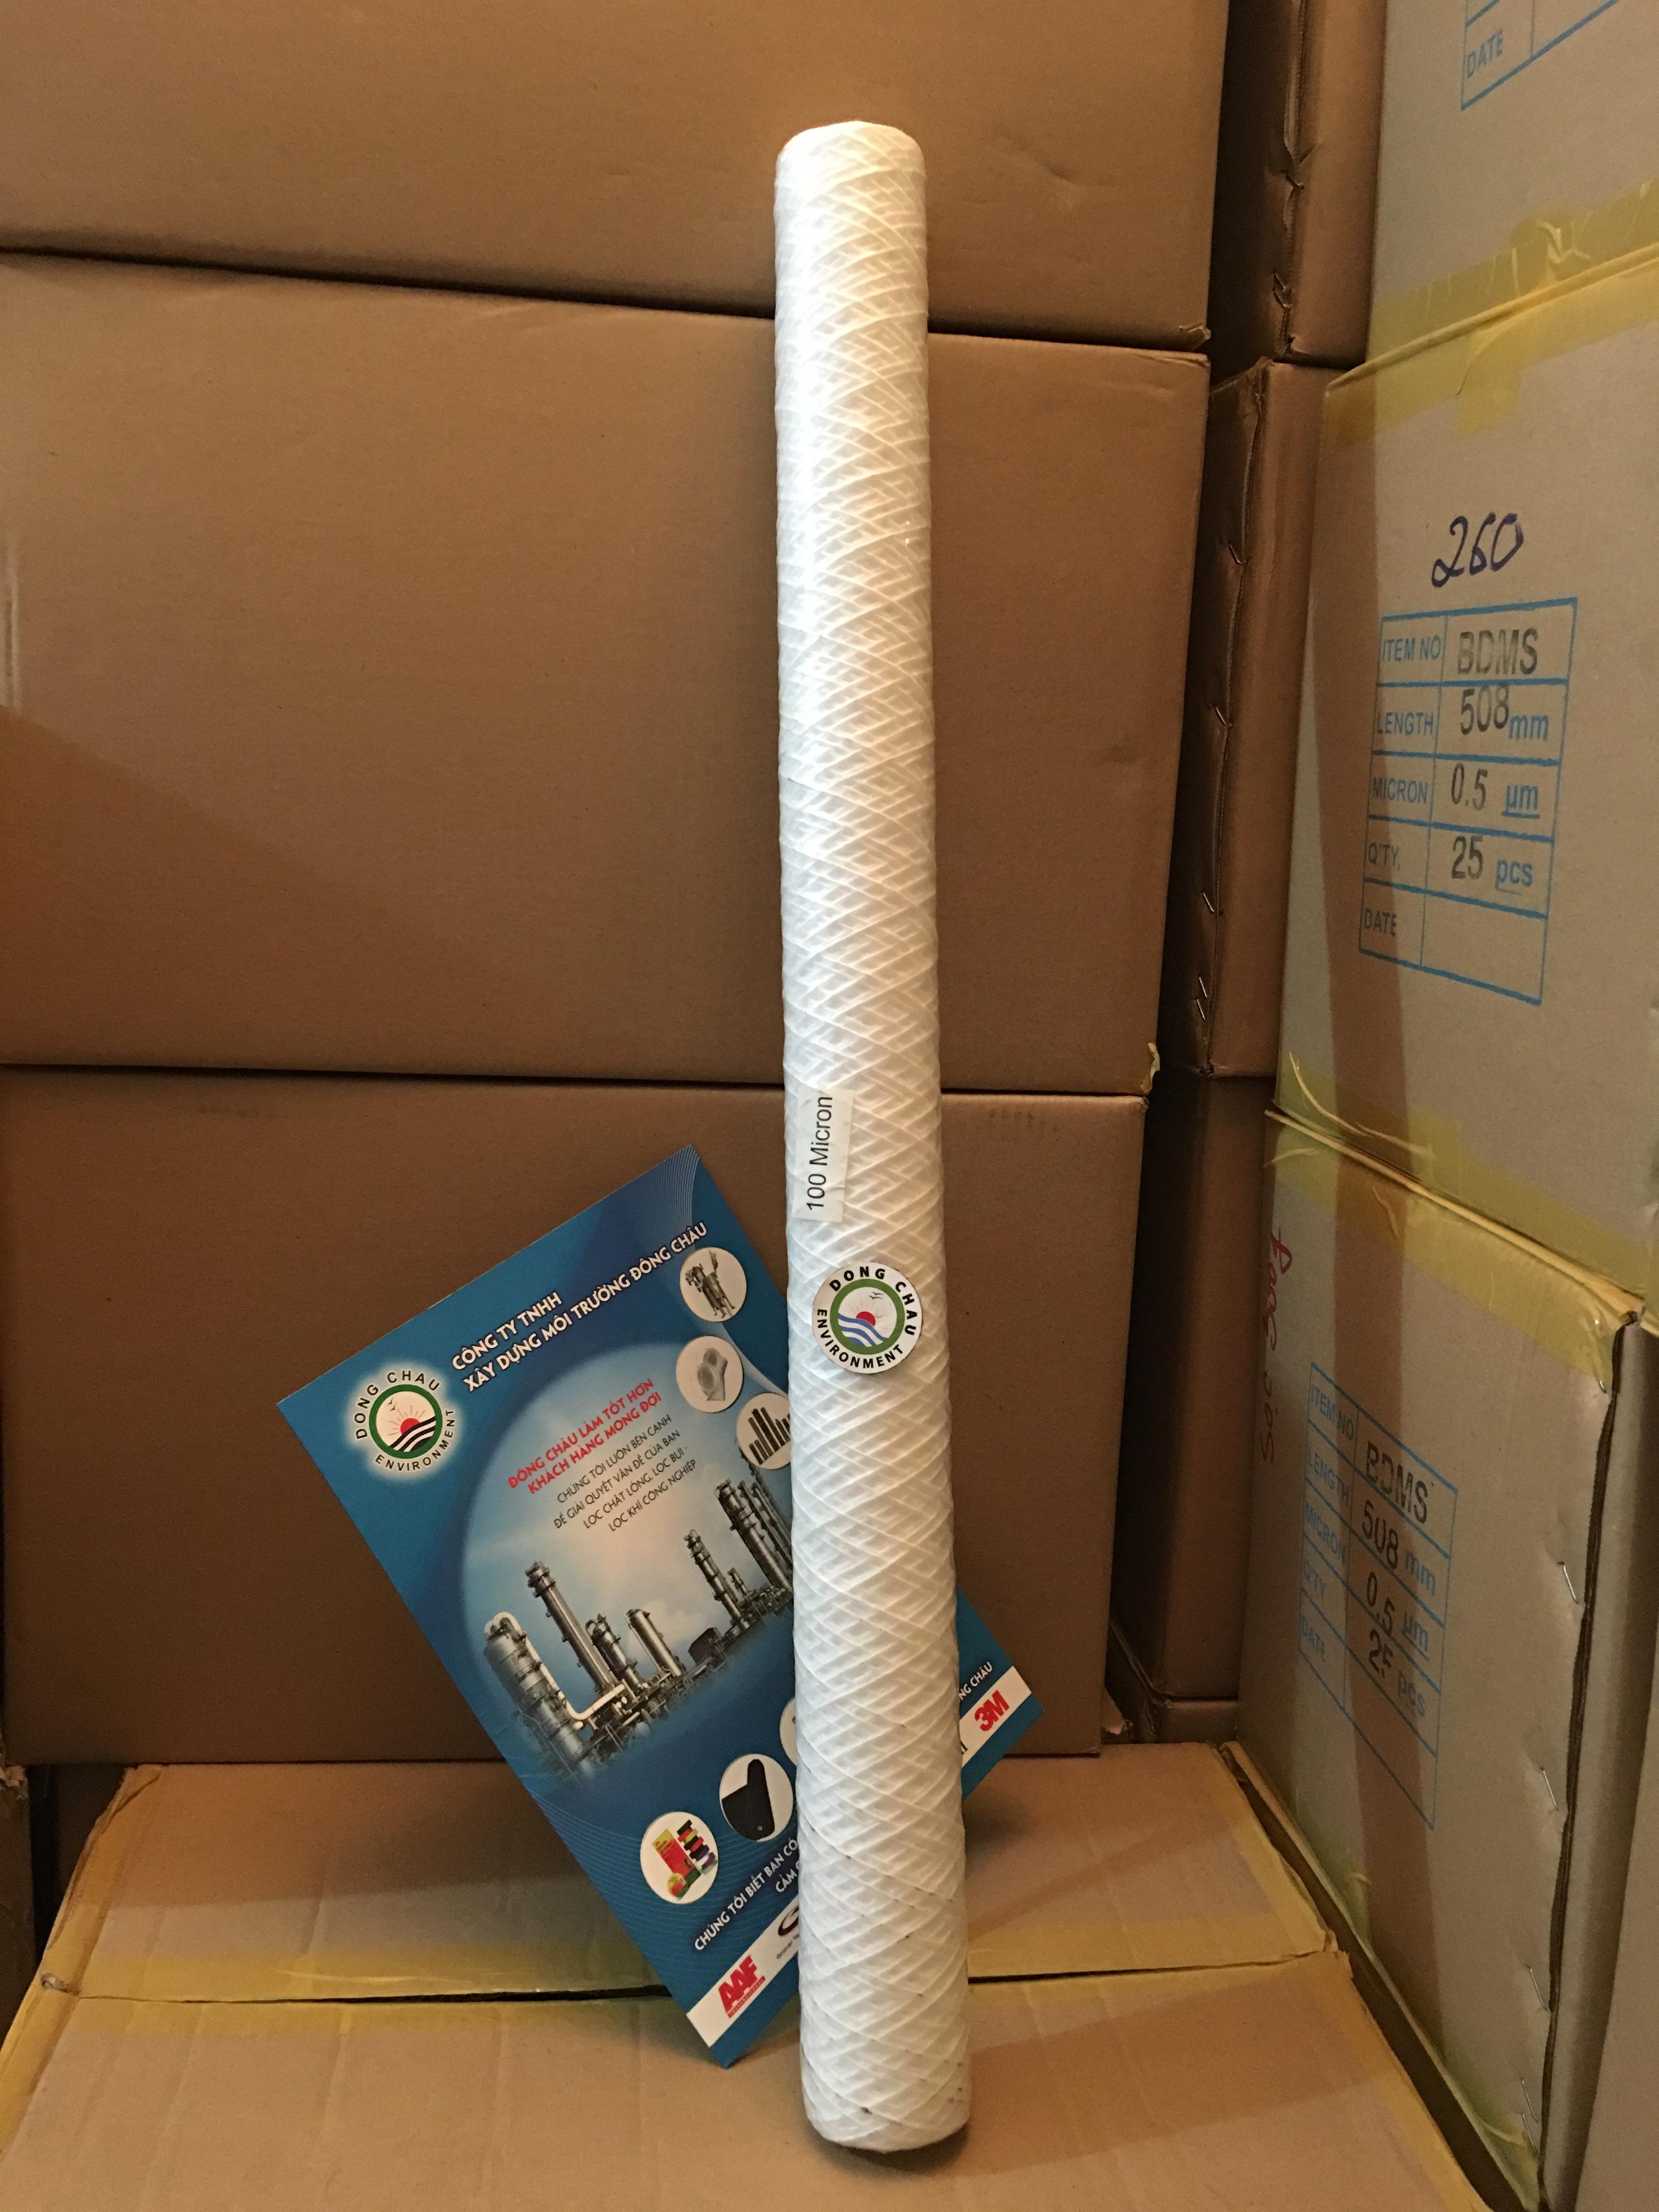 Lõi lọc sợi Aqua 100 micron 30 inch